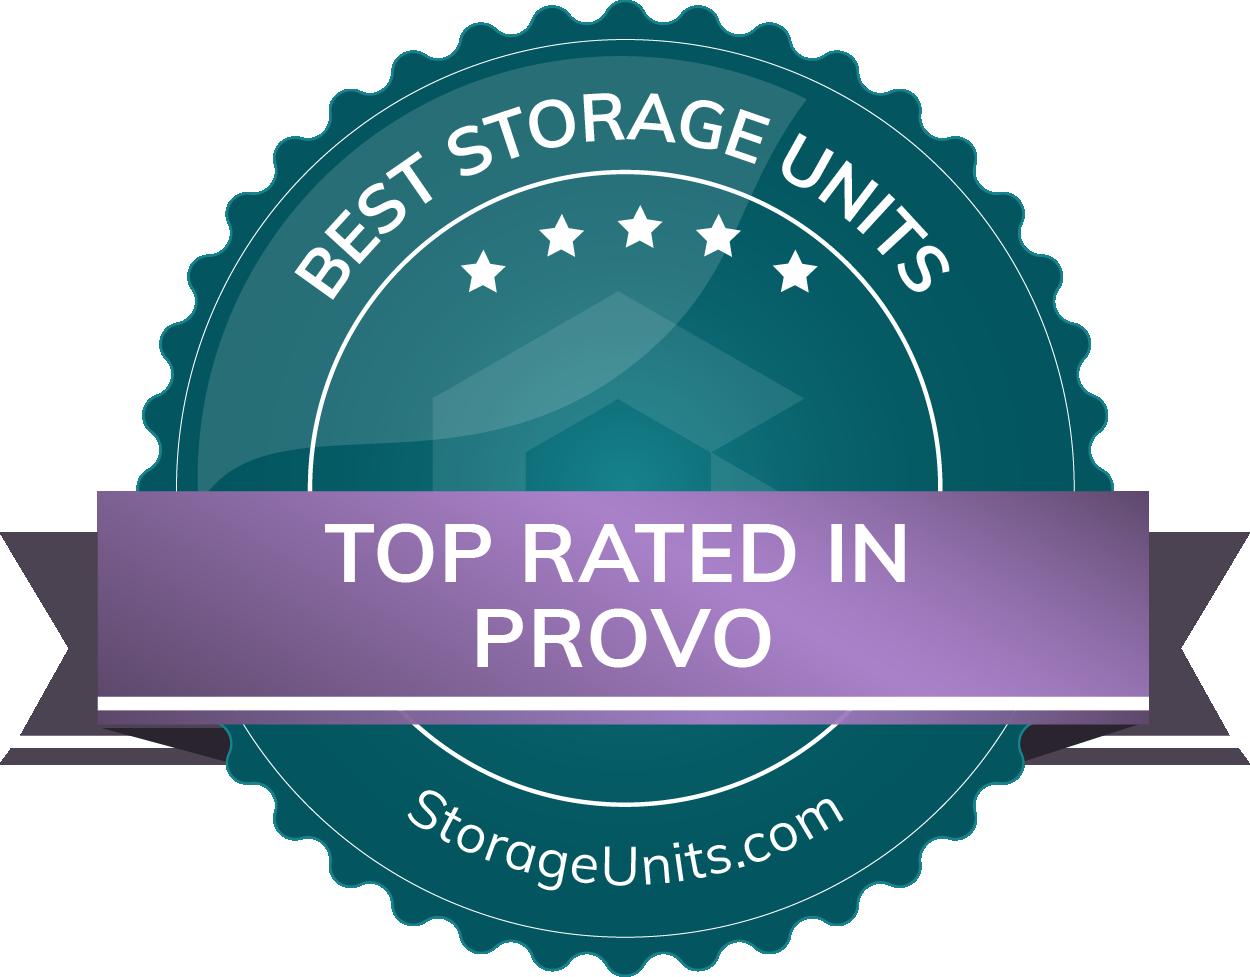 Best Self Storage Units in Provo, UT